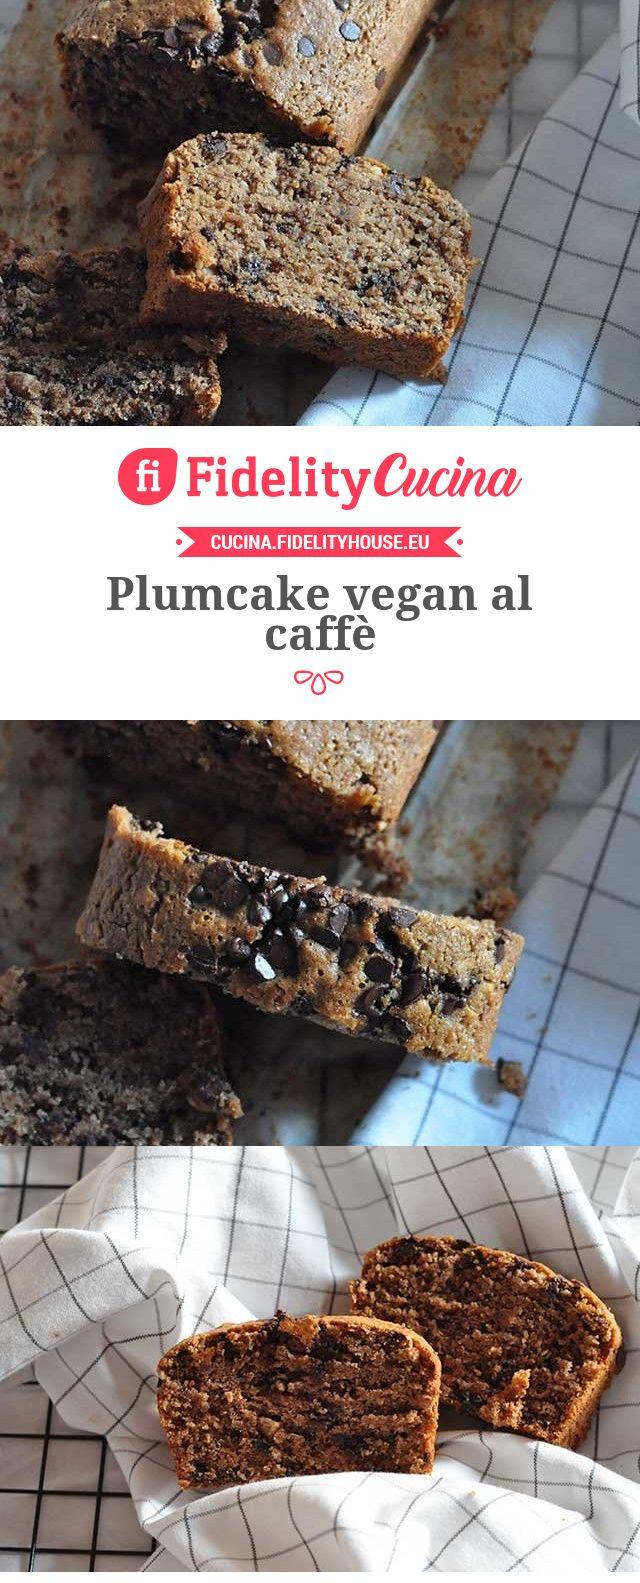 Plumcake vegan al caffè